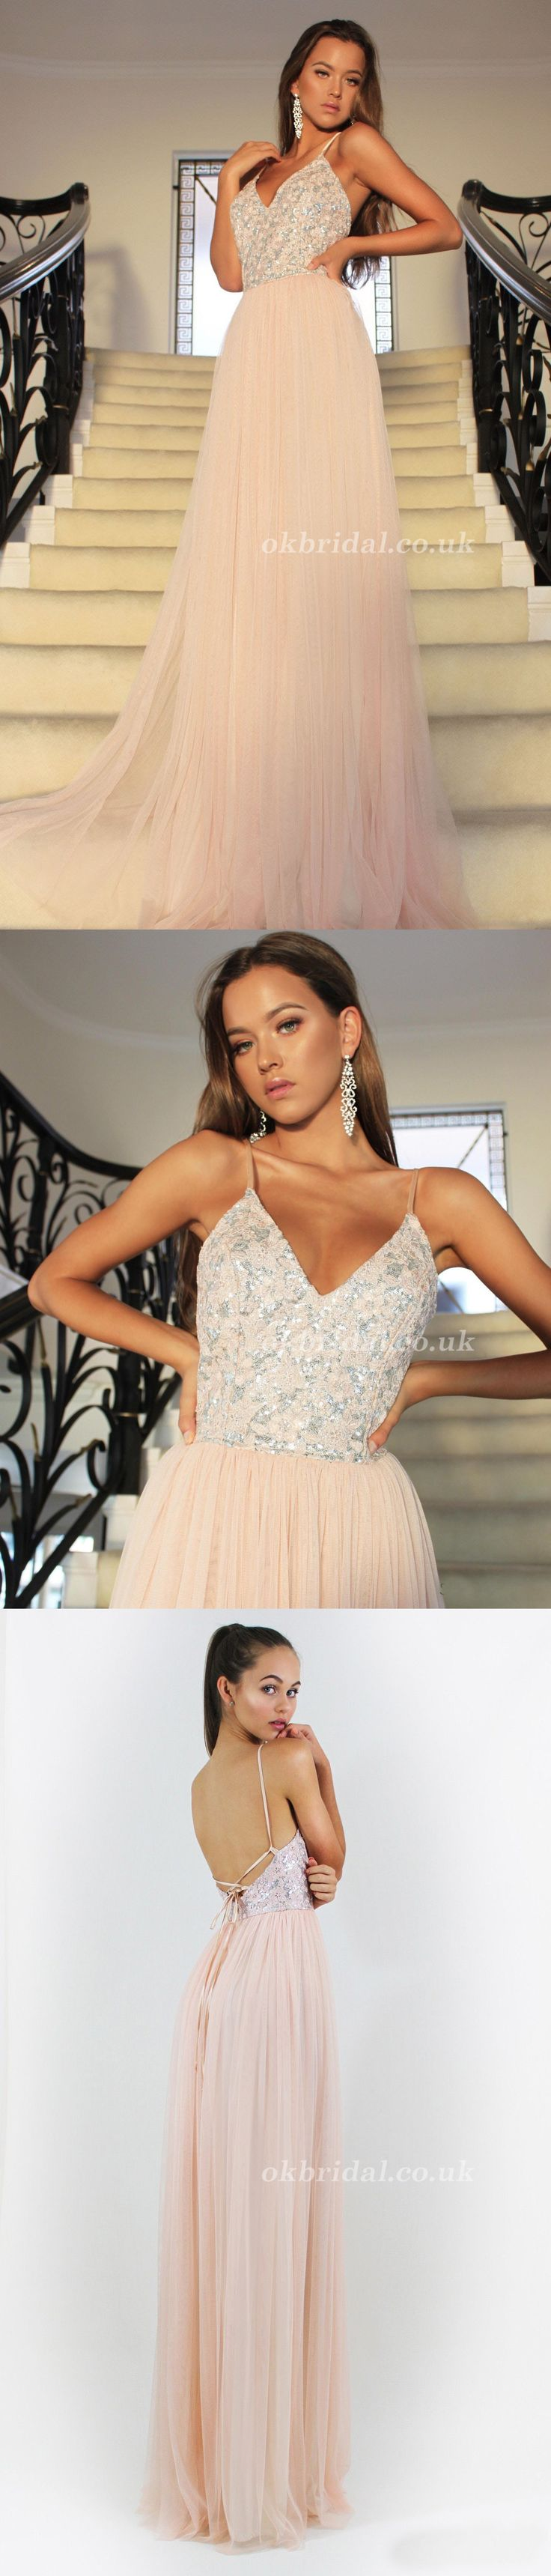 Spaghetti Straps Prom Dress, V-Neck Prom Dress, Tulle Prom Dress, Sequin Evening Dresses, LB0944 #okbridal